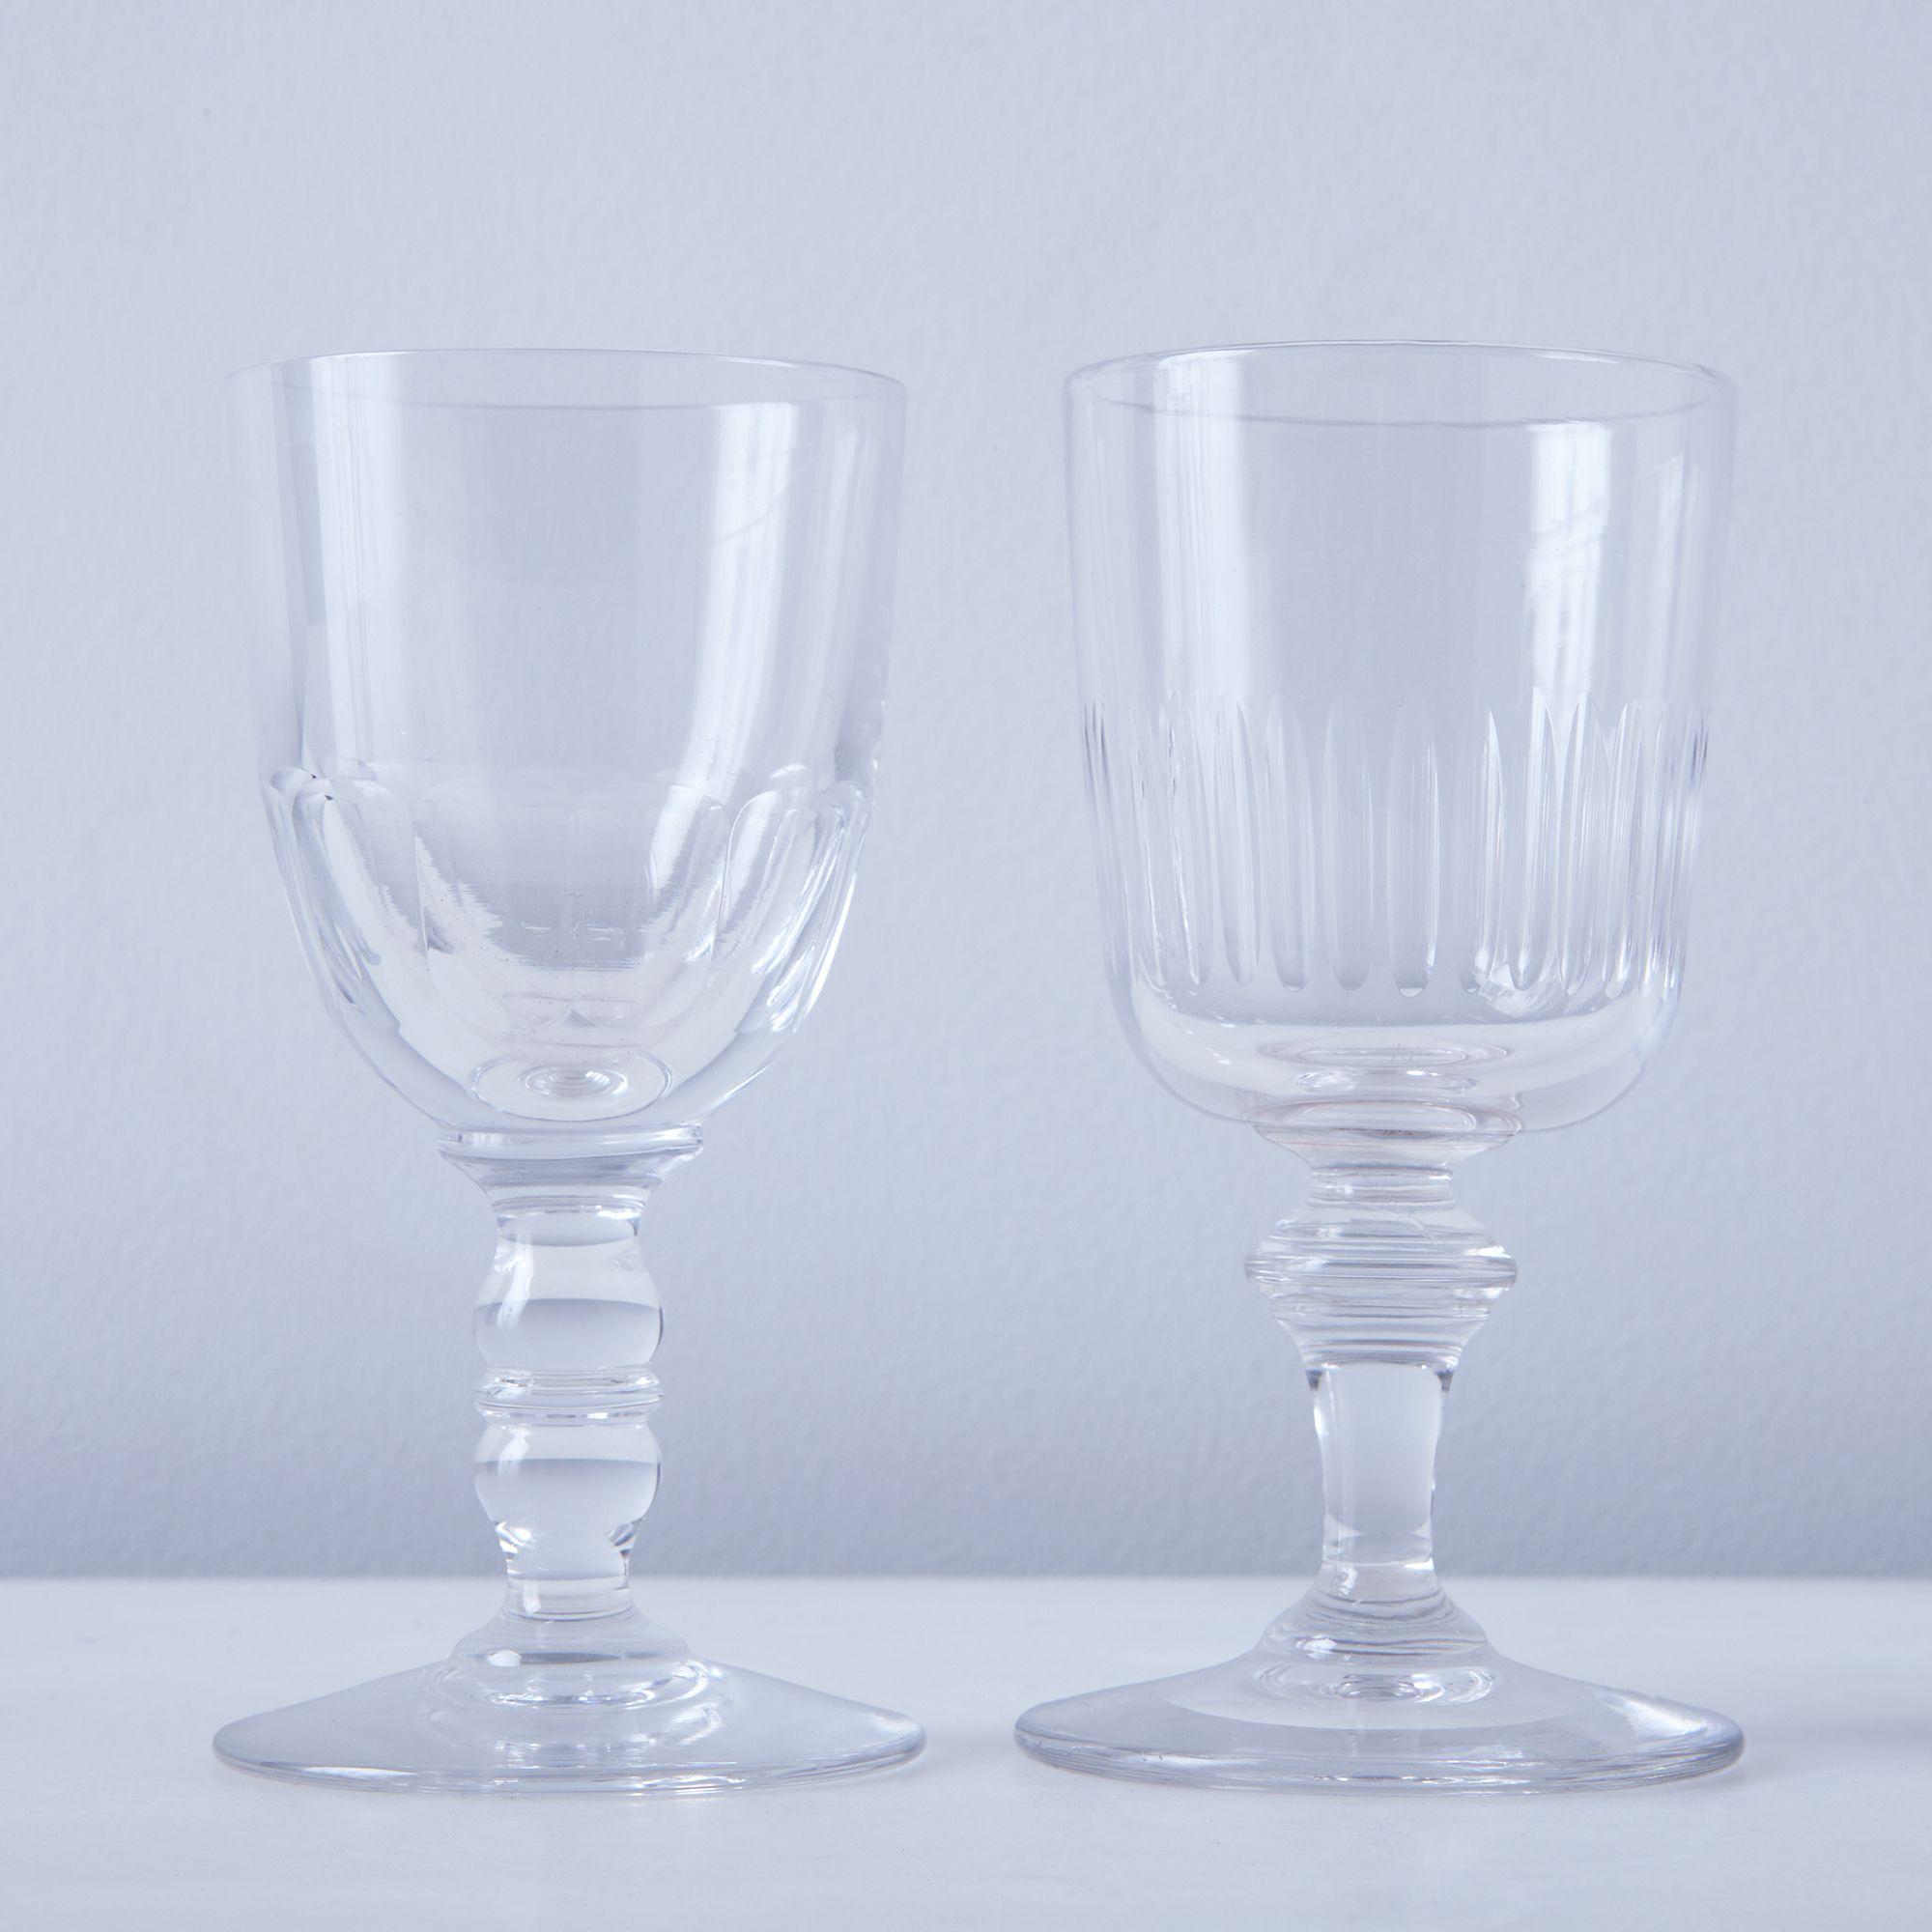 3c6e19ba 018f 4a6e 96eb 98f397174b38  2016 1011 food52 vintage shop vintage french aperitif glasses set of 2 silo rocky luten 0997